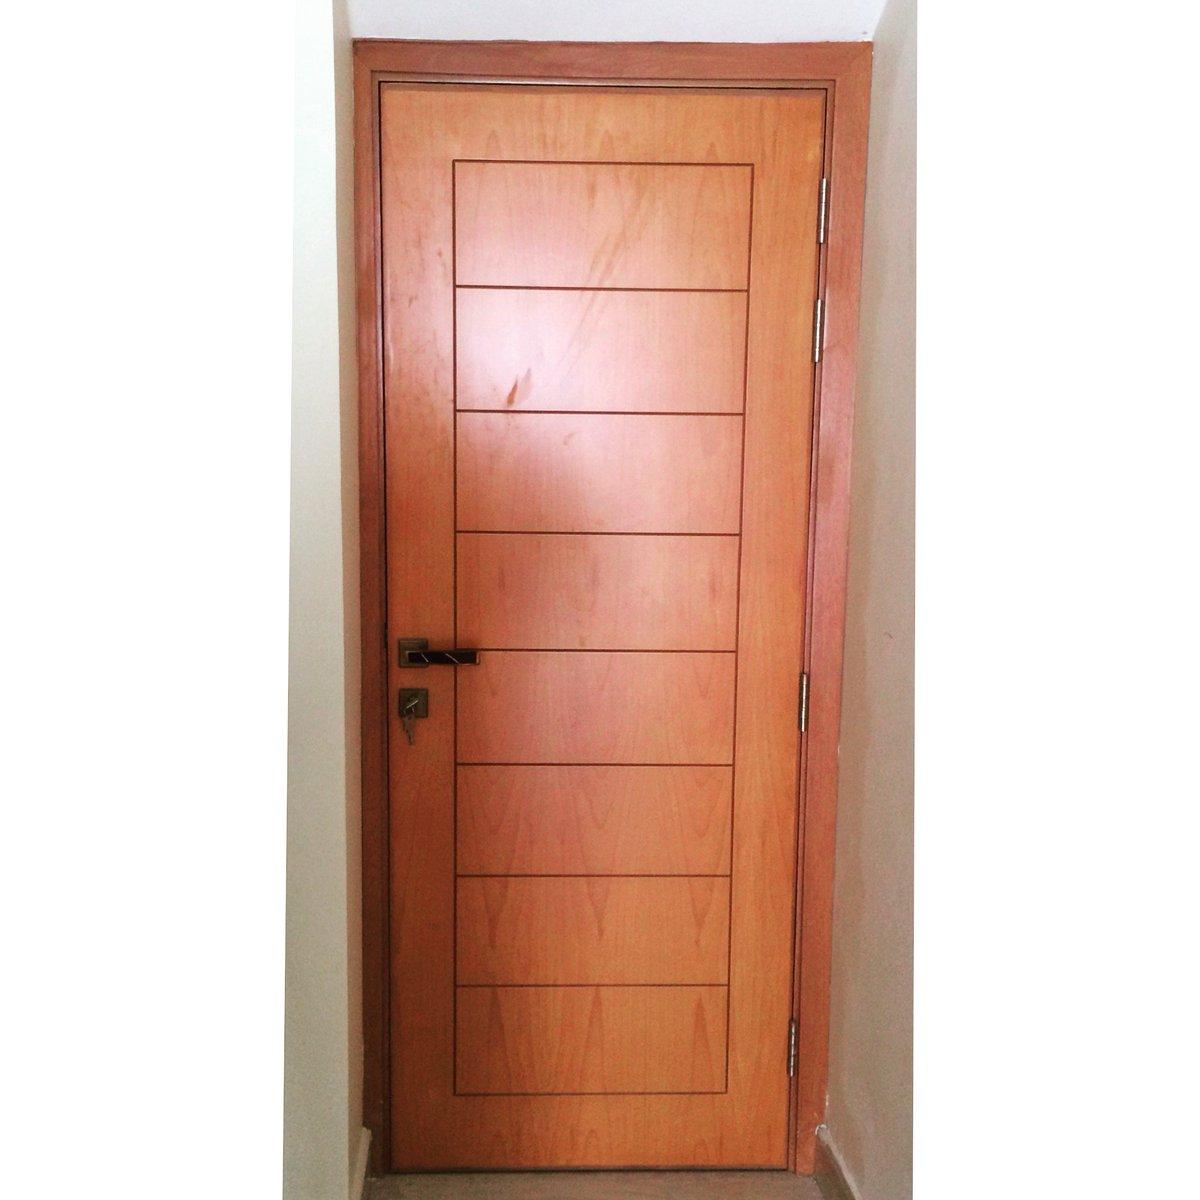 Nibras Al Qamar on Twitter \ Interior single door WoodSolid Meranti wood frame with Beech veneer shutter FinishNatural Beech stain #wood #doors ...  sc 1 st  Twitter & Nibras Al Qamar on Twitter: \